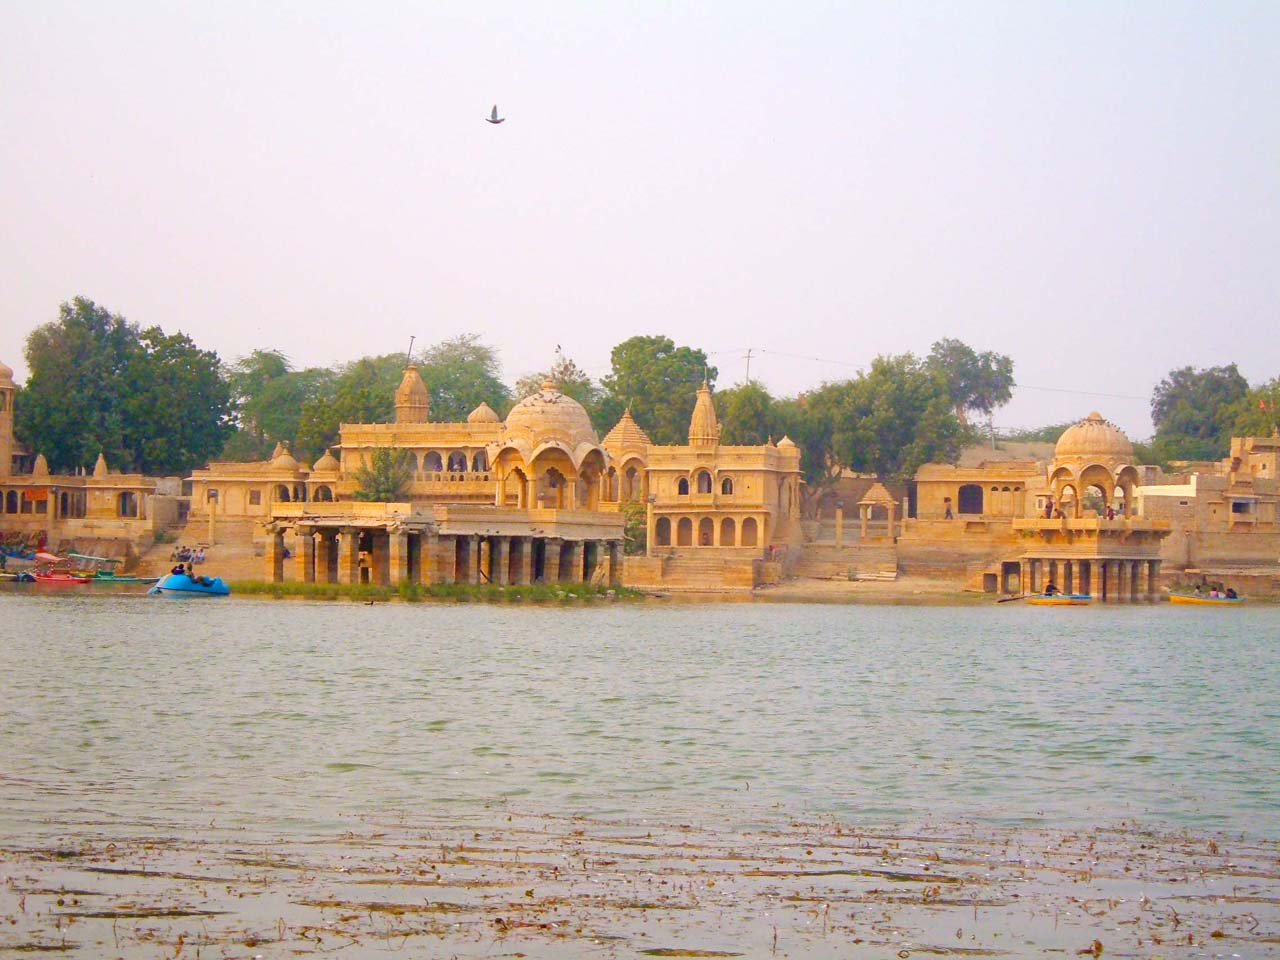 Temples Gadisar Lake - Jaisalmer's places to visit